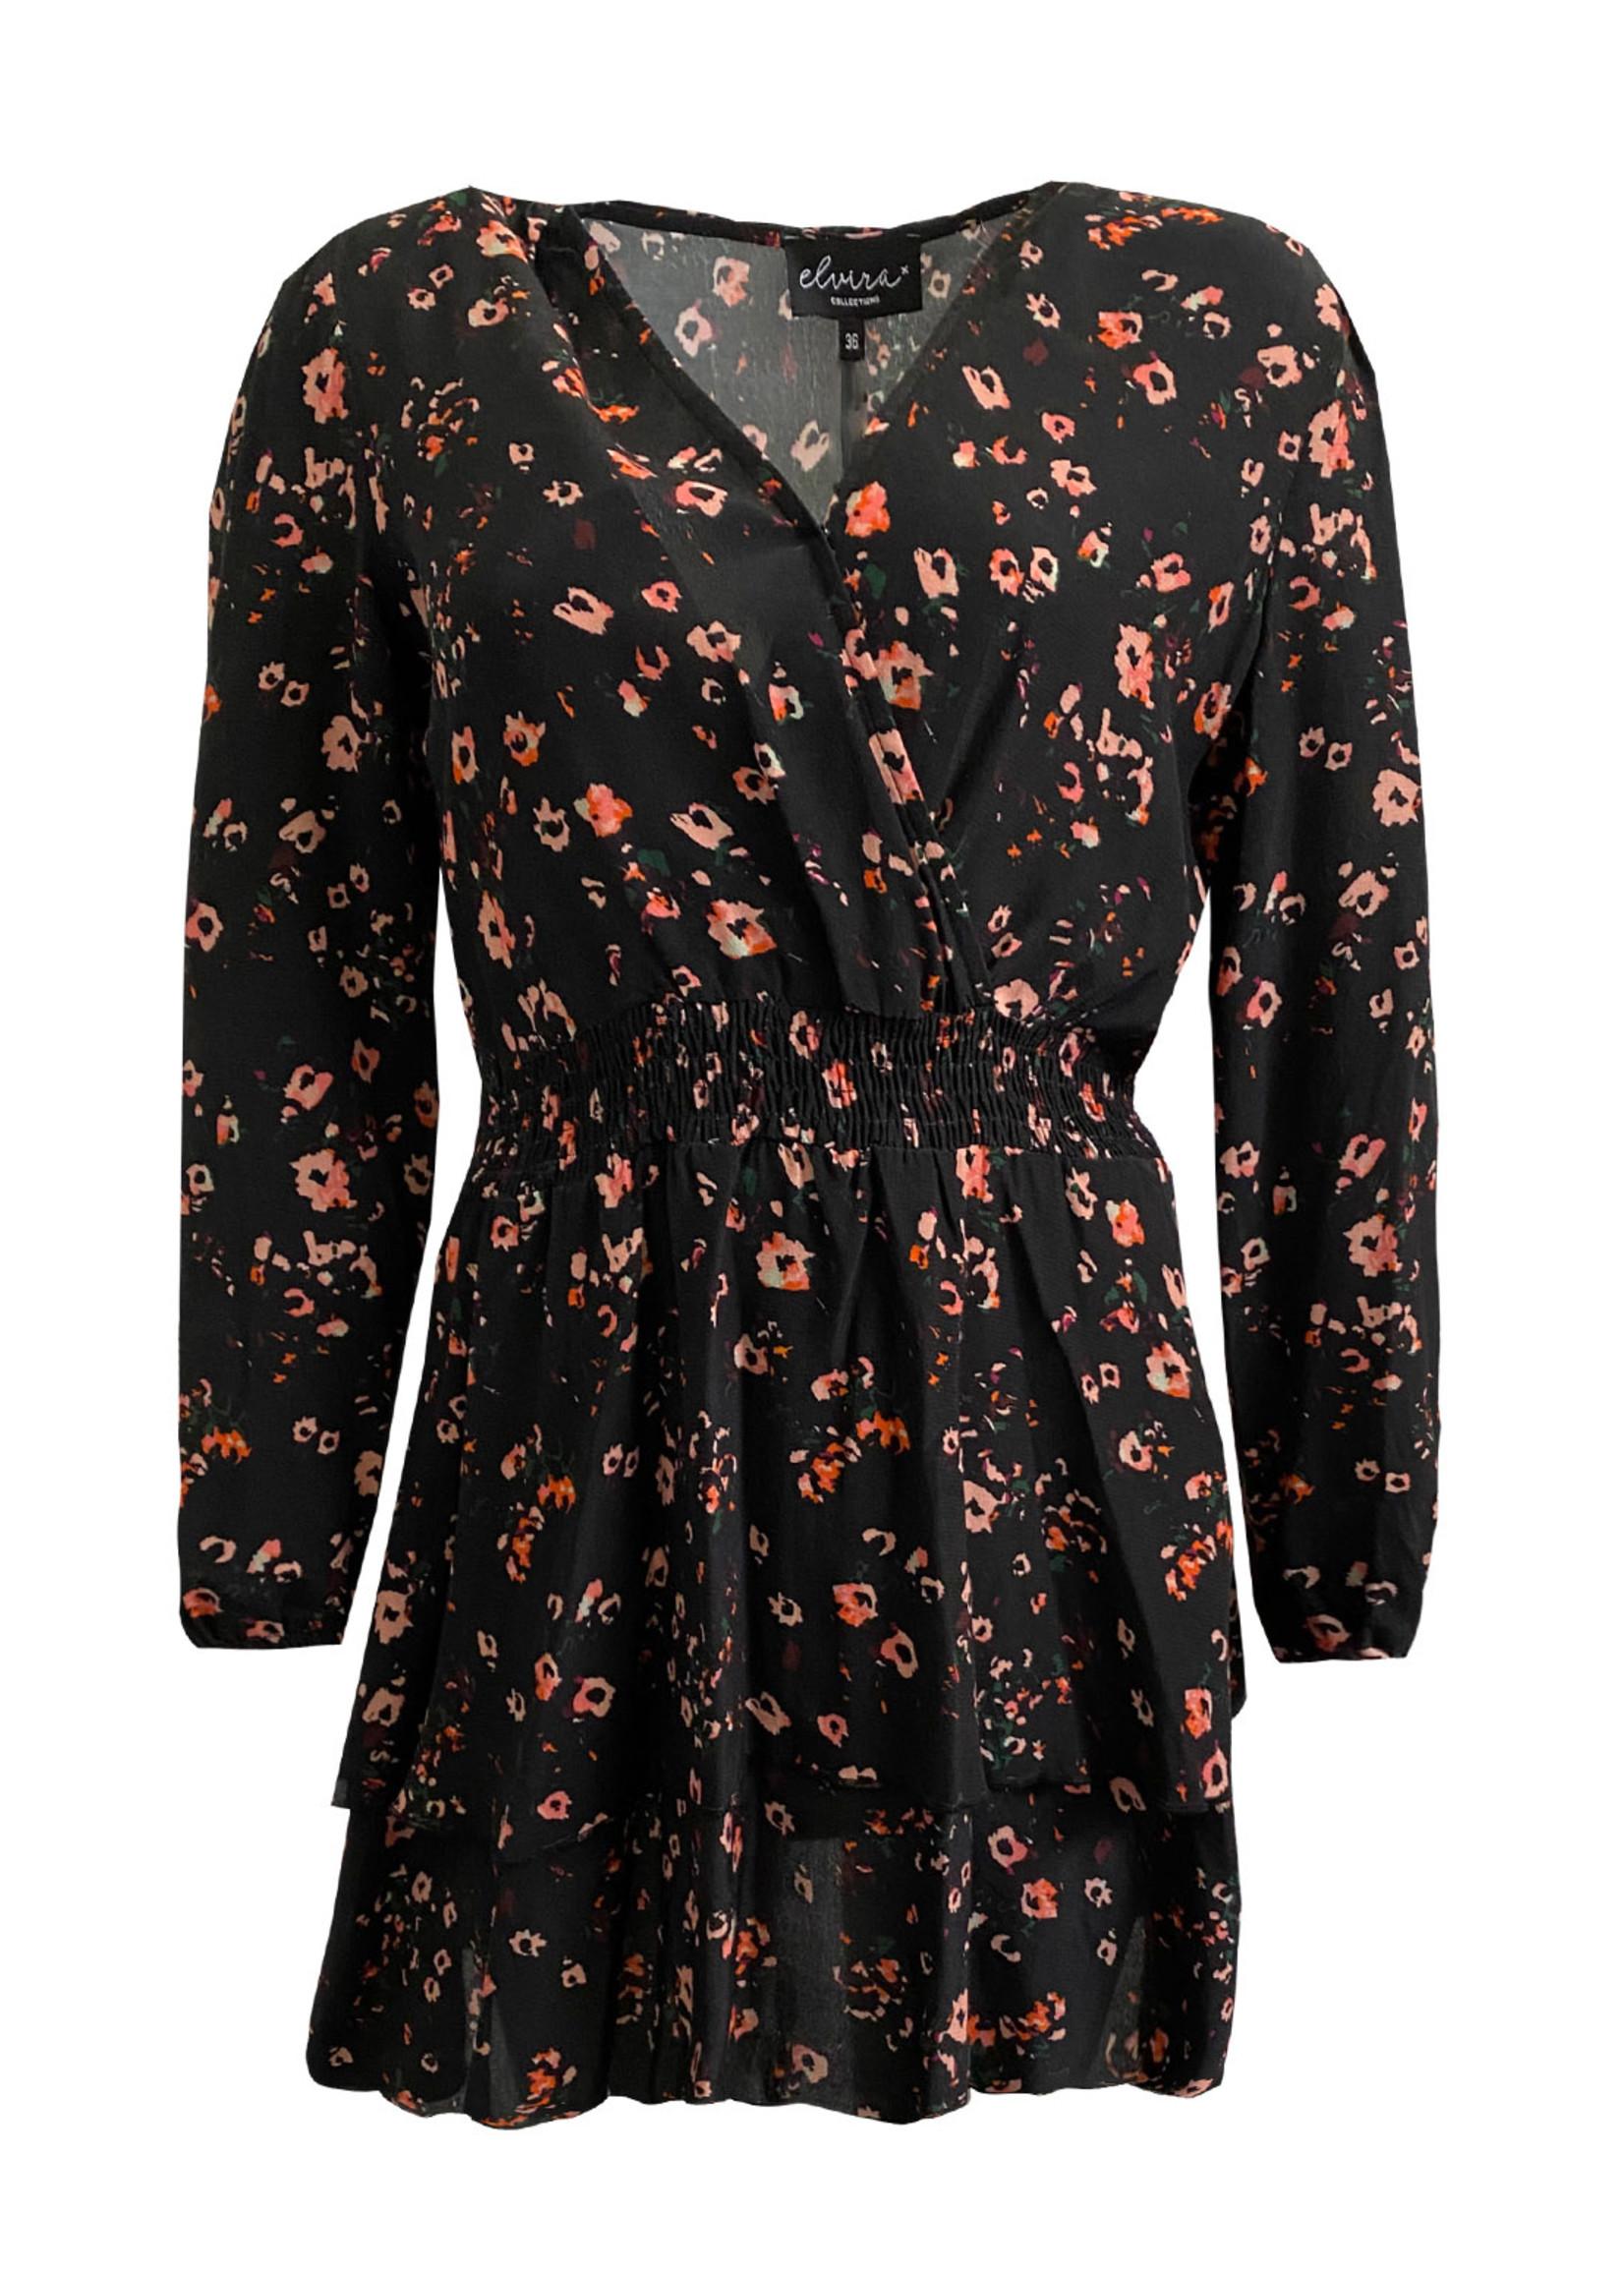 Elvira Collections Elvira Collections Yade Dress